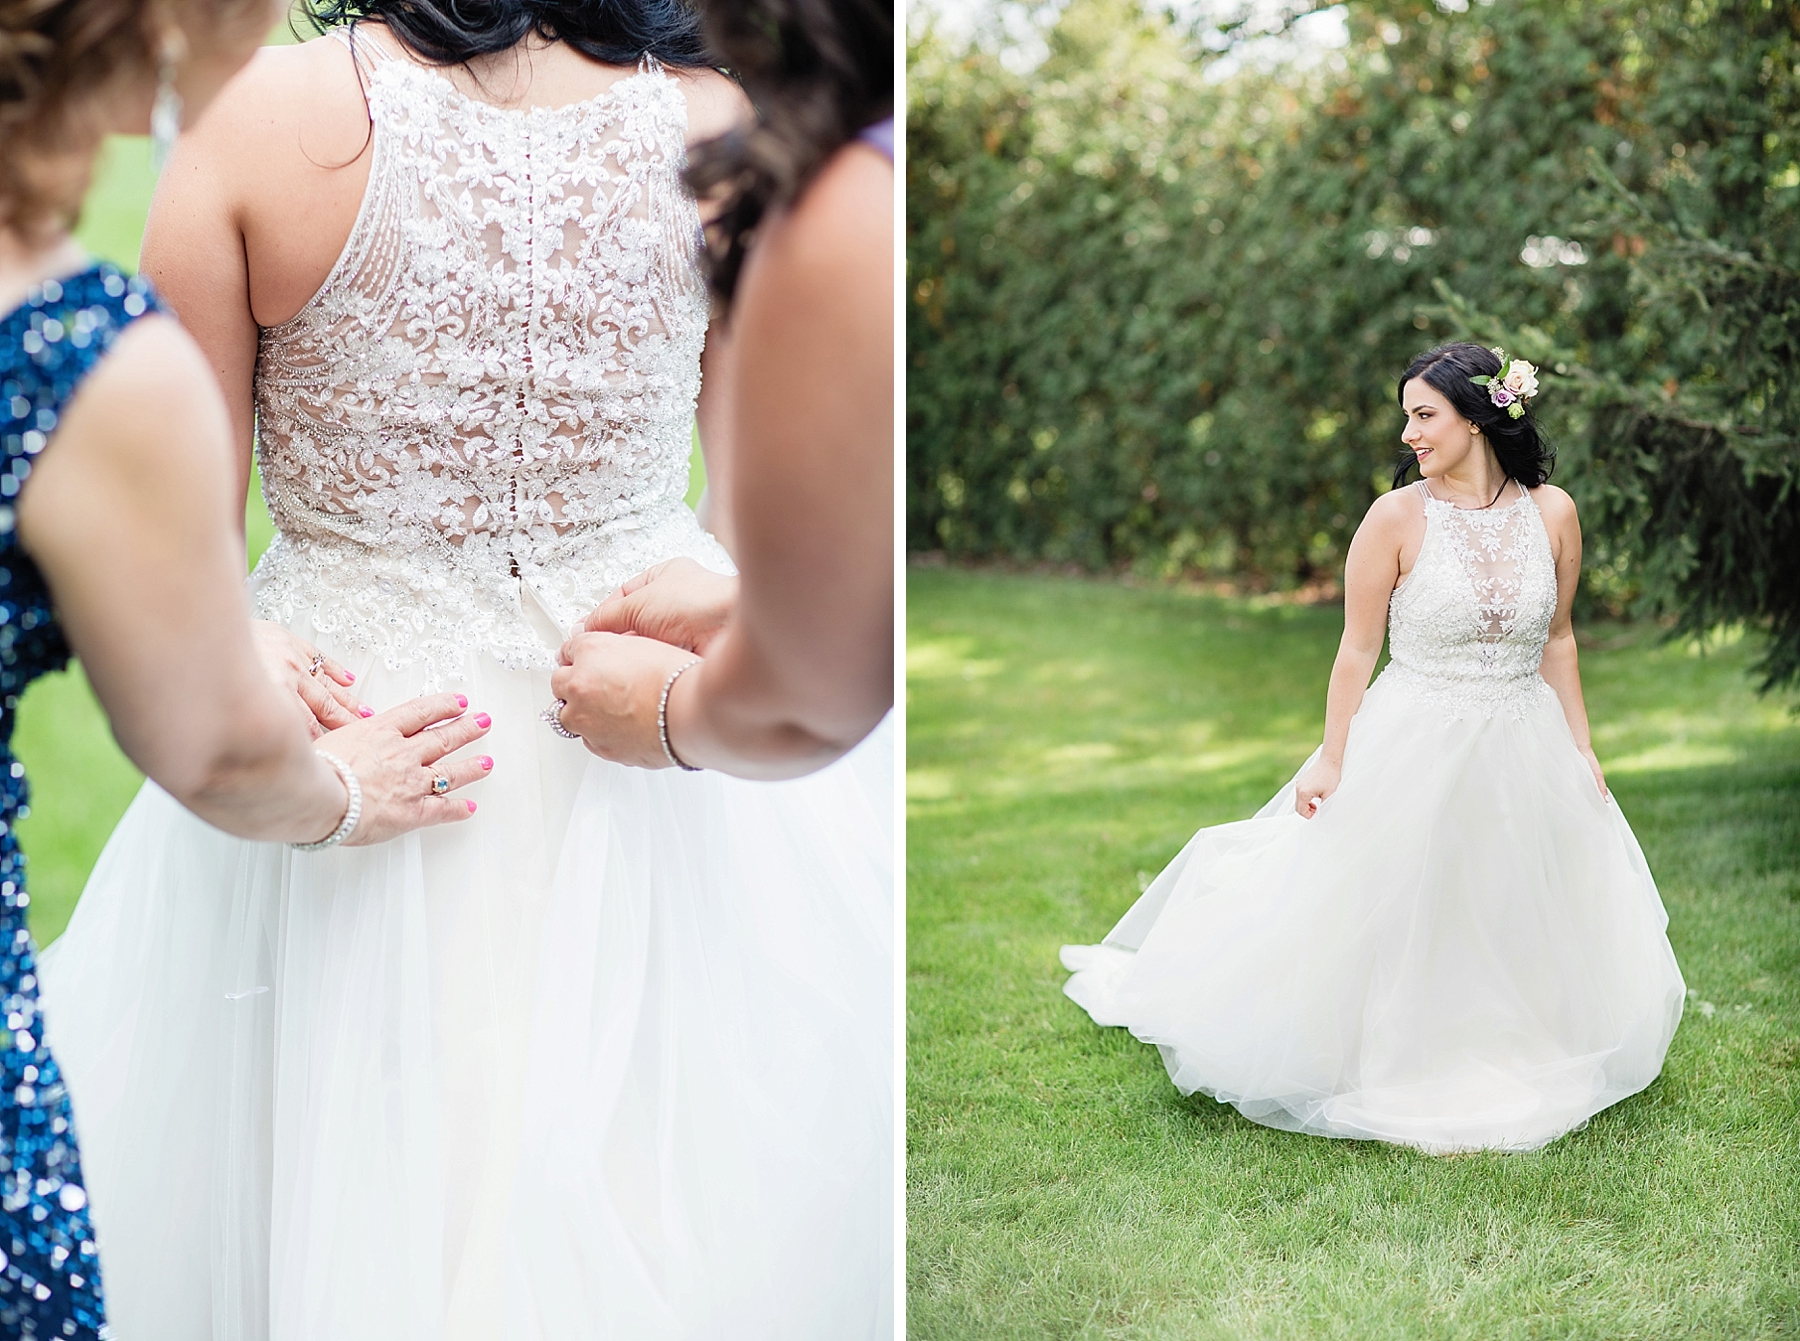 windsor-wedding-photographer-sprucewood-shores-winery-wedding-niagara-on-the-lake-wedding-photographer-eryn-shea-photography_0013.jpg